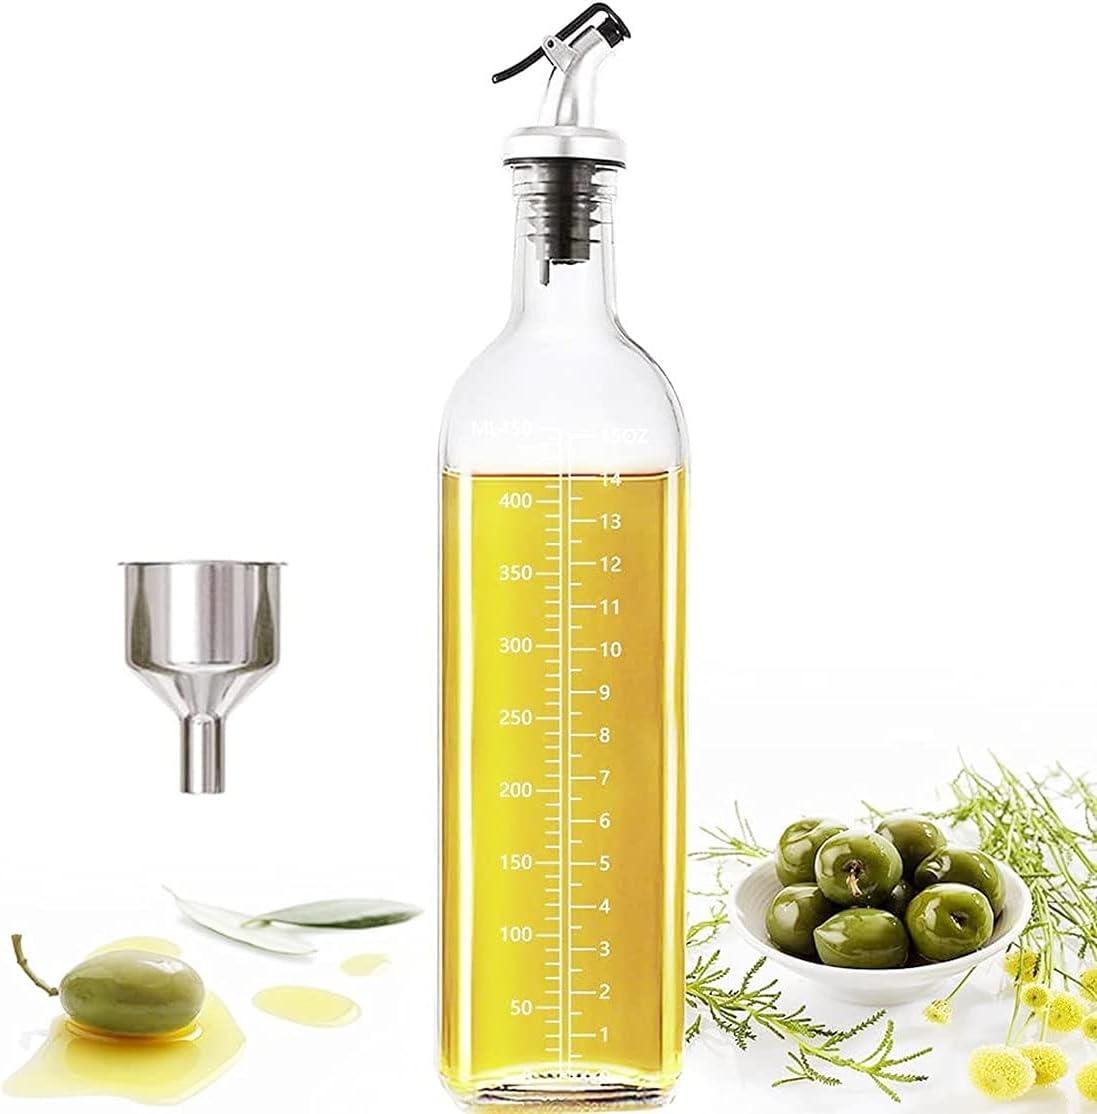 Olive Oil Seasonal Wrap Introduction Dispenser Milwaukee Mall Vinegar for Bottle and Kitch